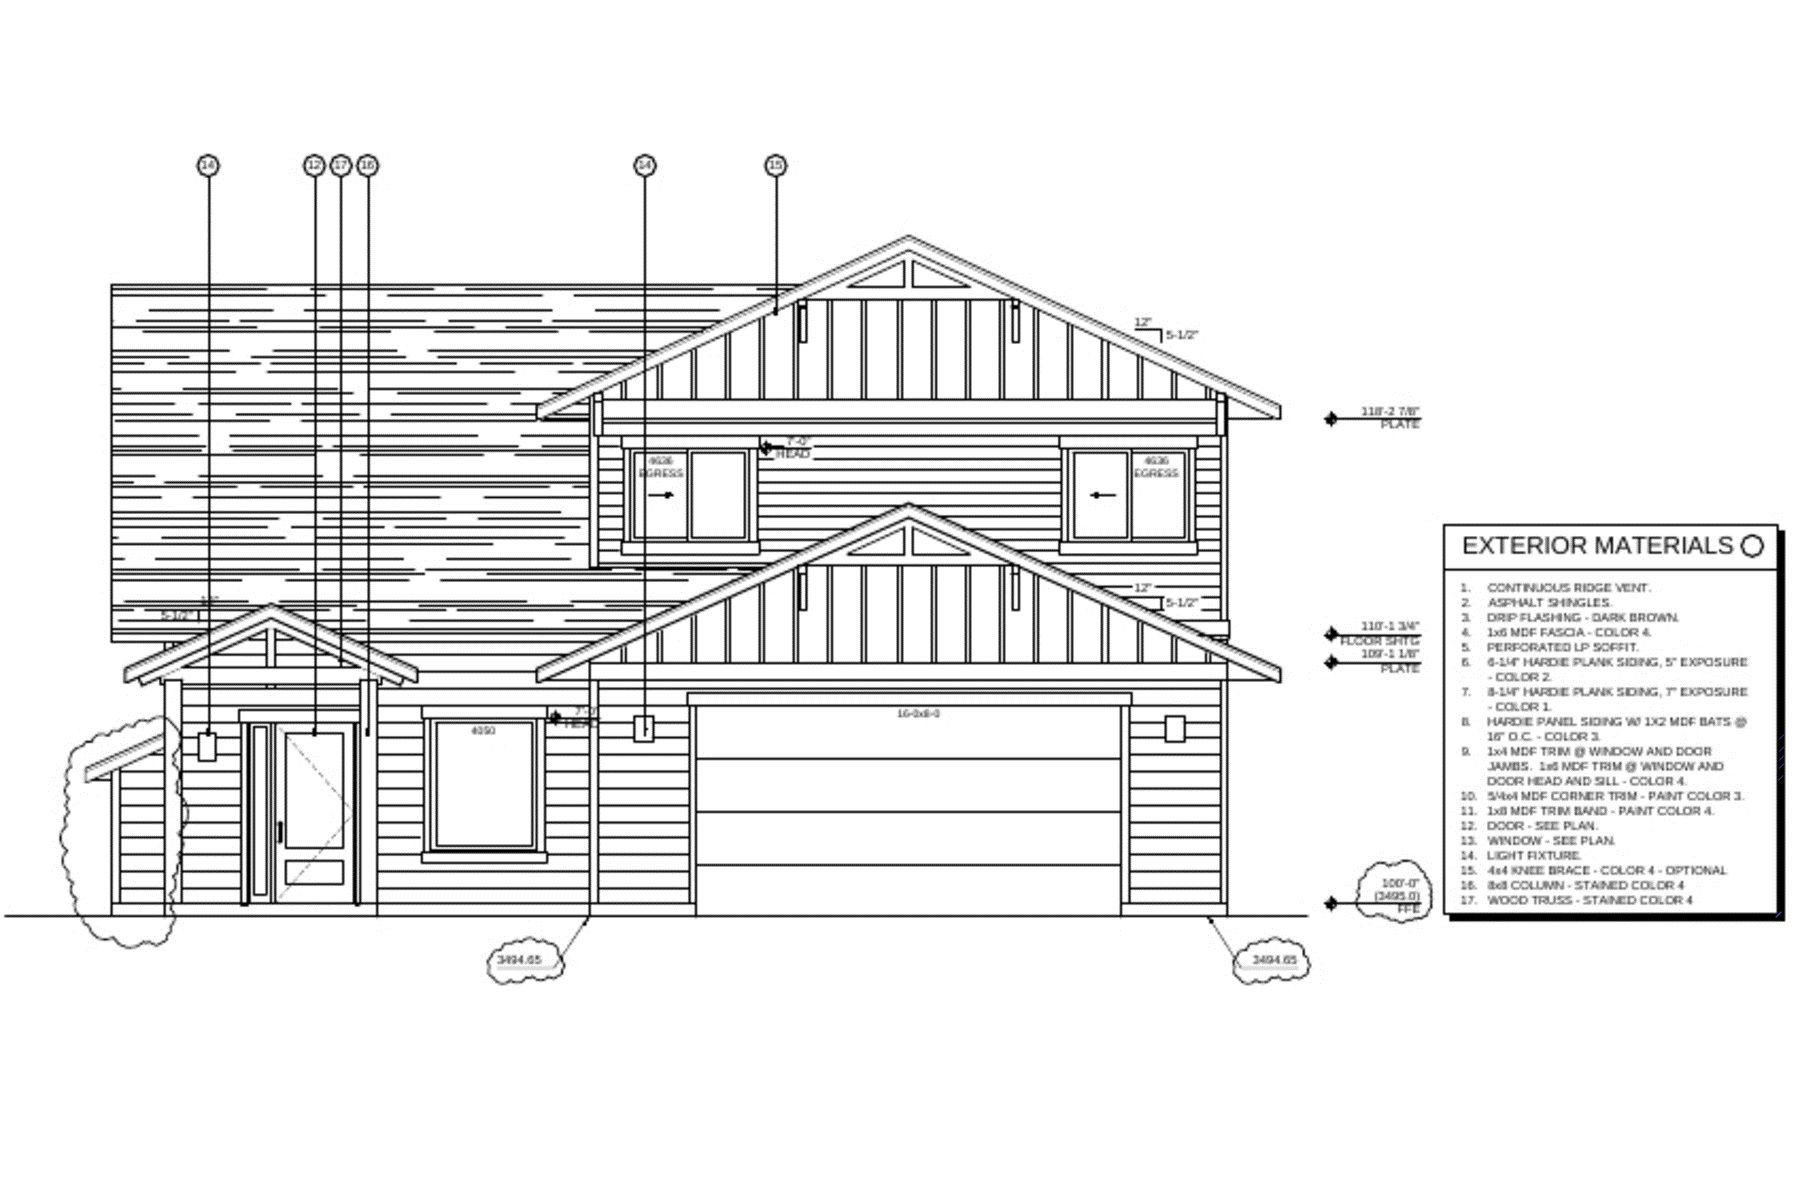 Single Family Home for Sale at 7113 Avery Ln , Missoula, MT 59803 7113 Avery Ln Missoula, Montana 59803 United States